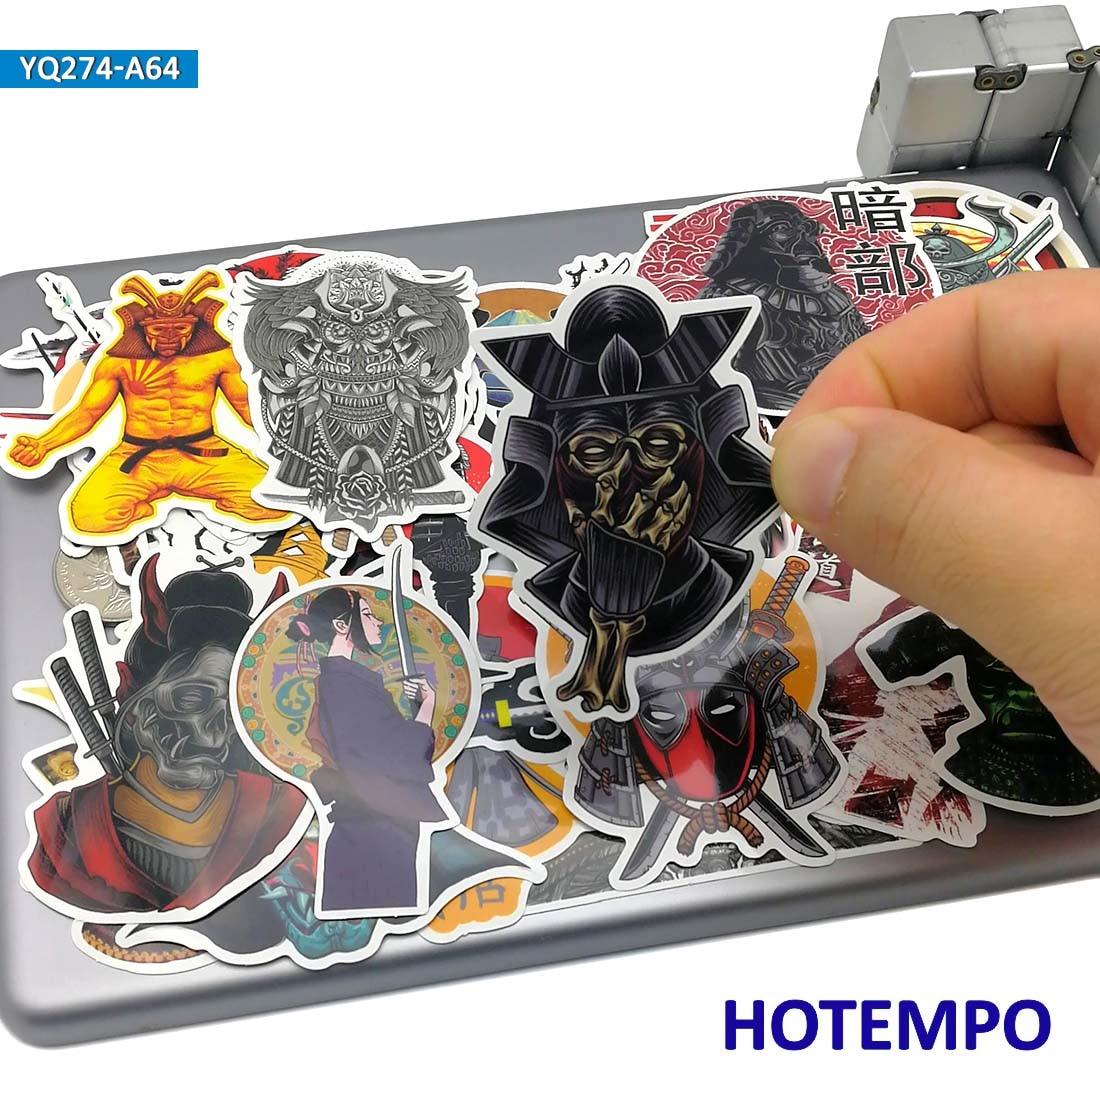 60pcs Japan Samurai Bushido Spirit Style Art Sticker For Mobile Phone Laptop Luggage Guitar Skateboard Bike PVC Waterproof Decal